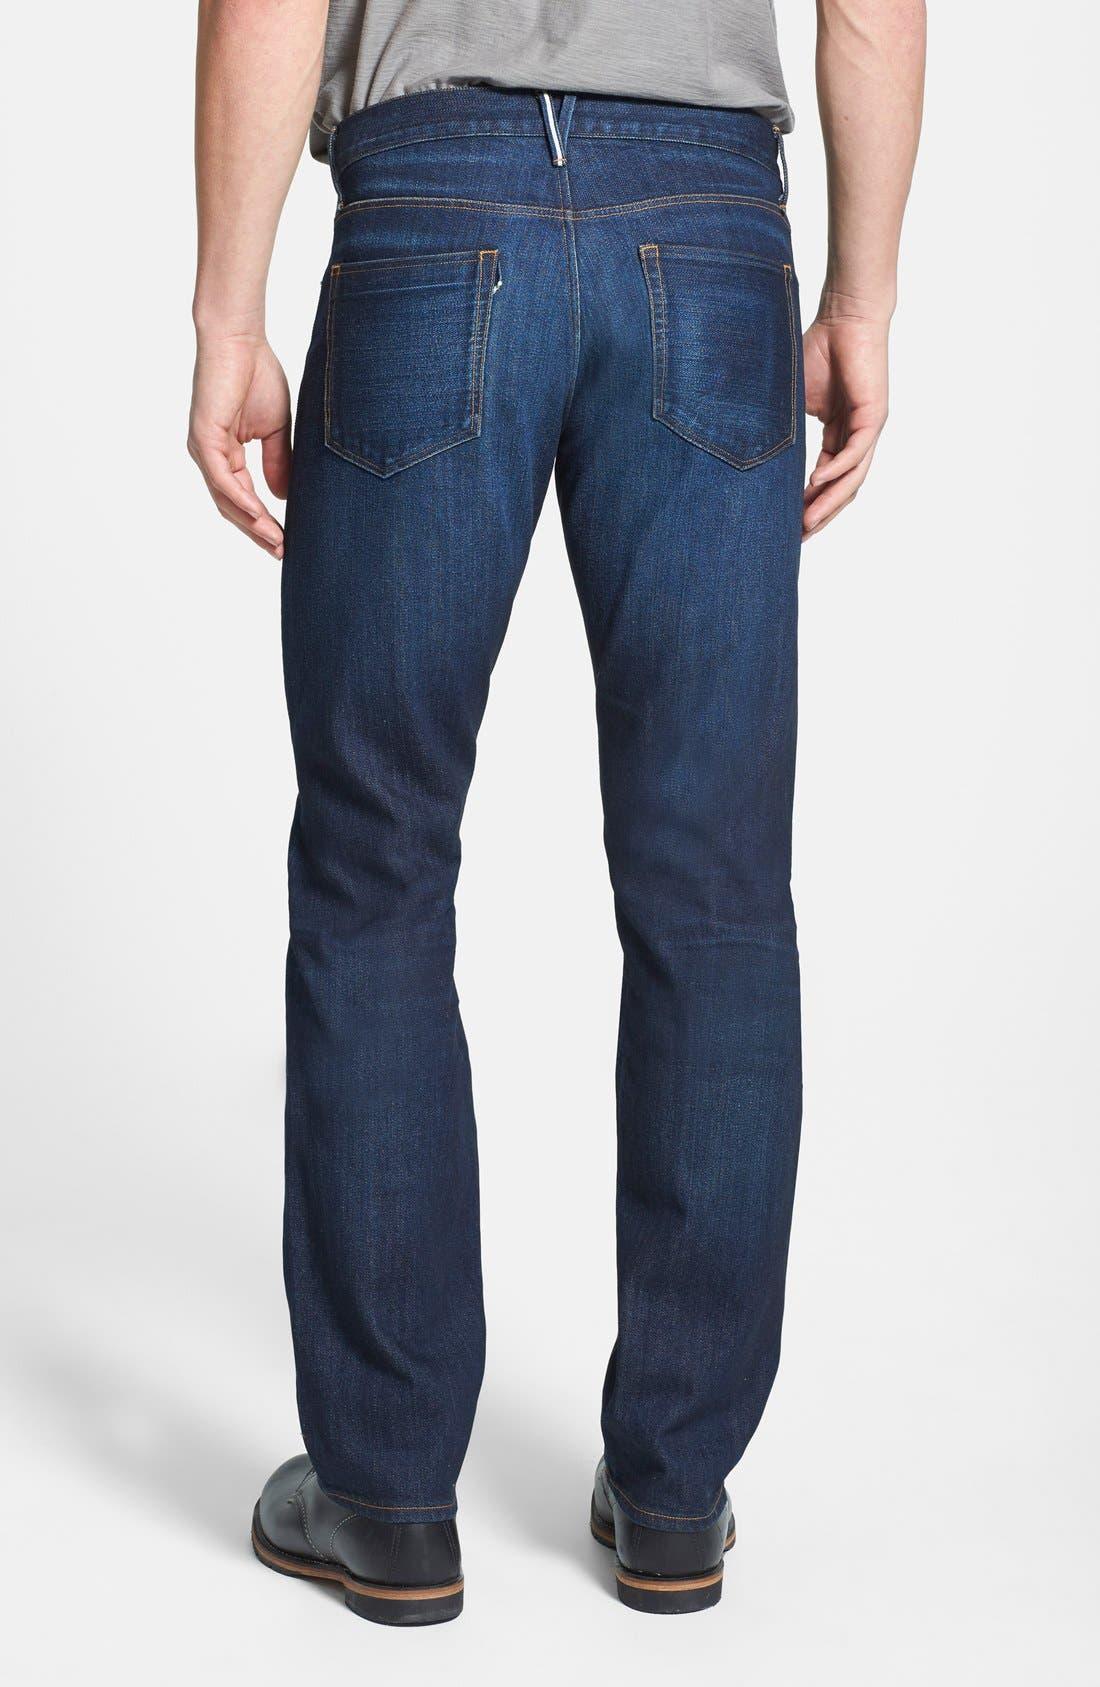 'M4' Straight Leg Selvedge Jeans,                             Alternate thumbnail 2, color,                             Makers